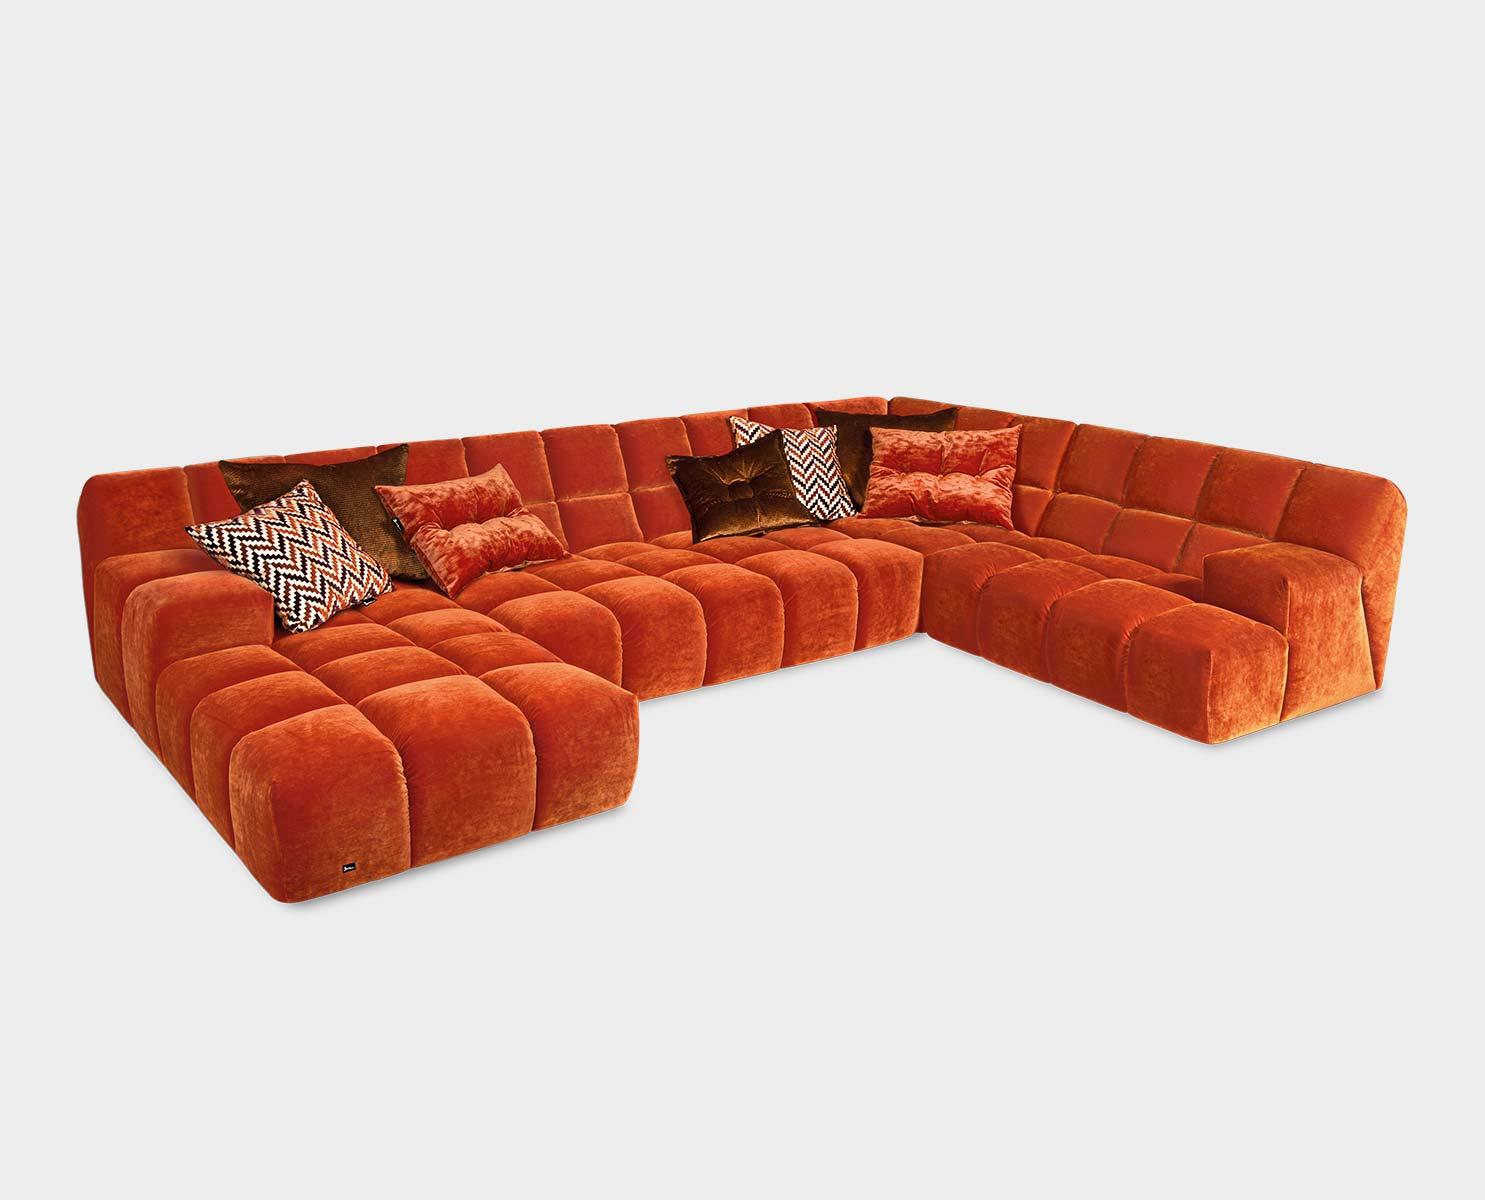 ocean7 sofa gruppenbild bretz. Black Bedroom Furniture Sets. Home Design Ideas